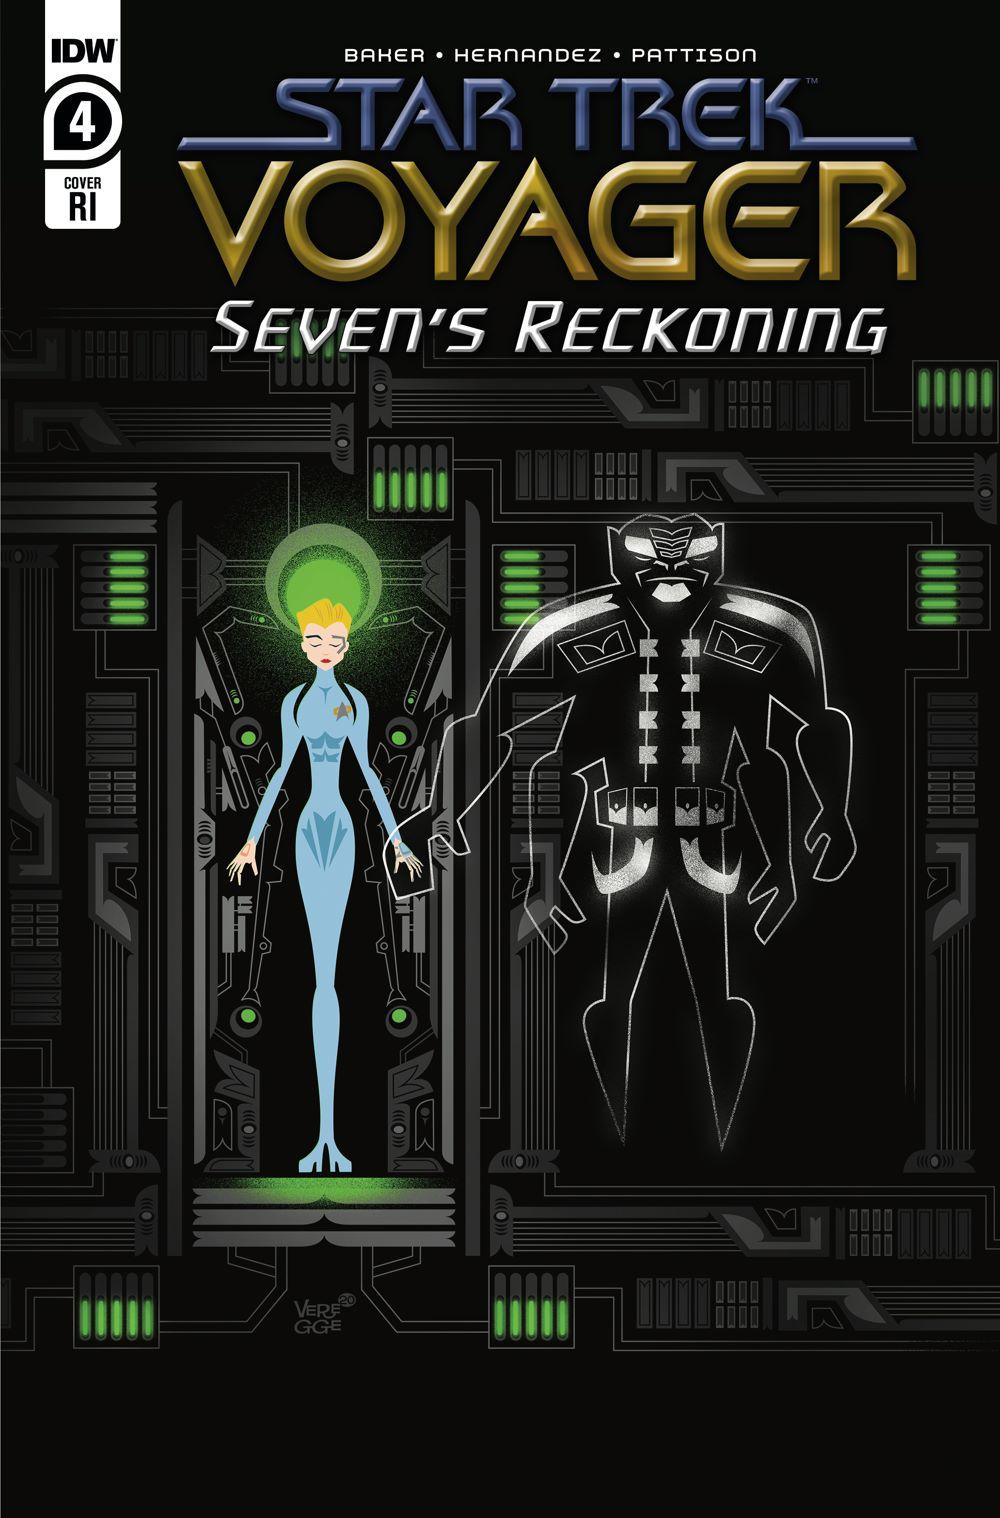 ST_Voyager_SR04-coverRI ComicList Previews: STAR TREK VOYAGER SEVEN'S RECKONING #4 (OF 4)